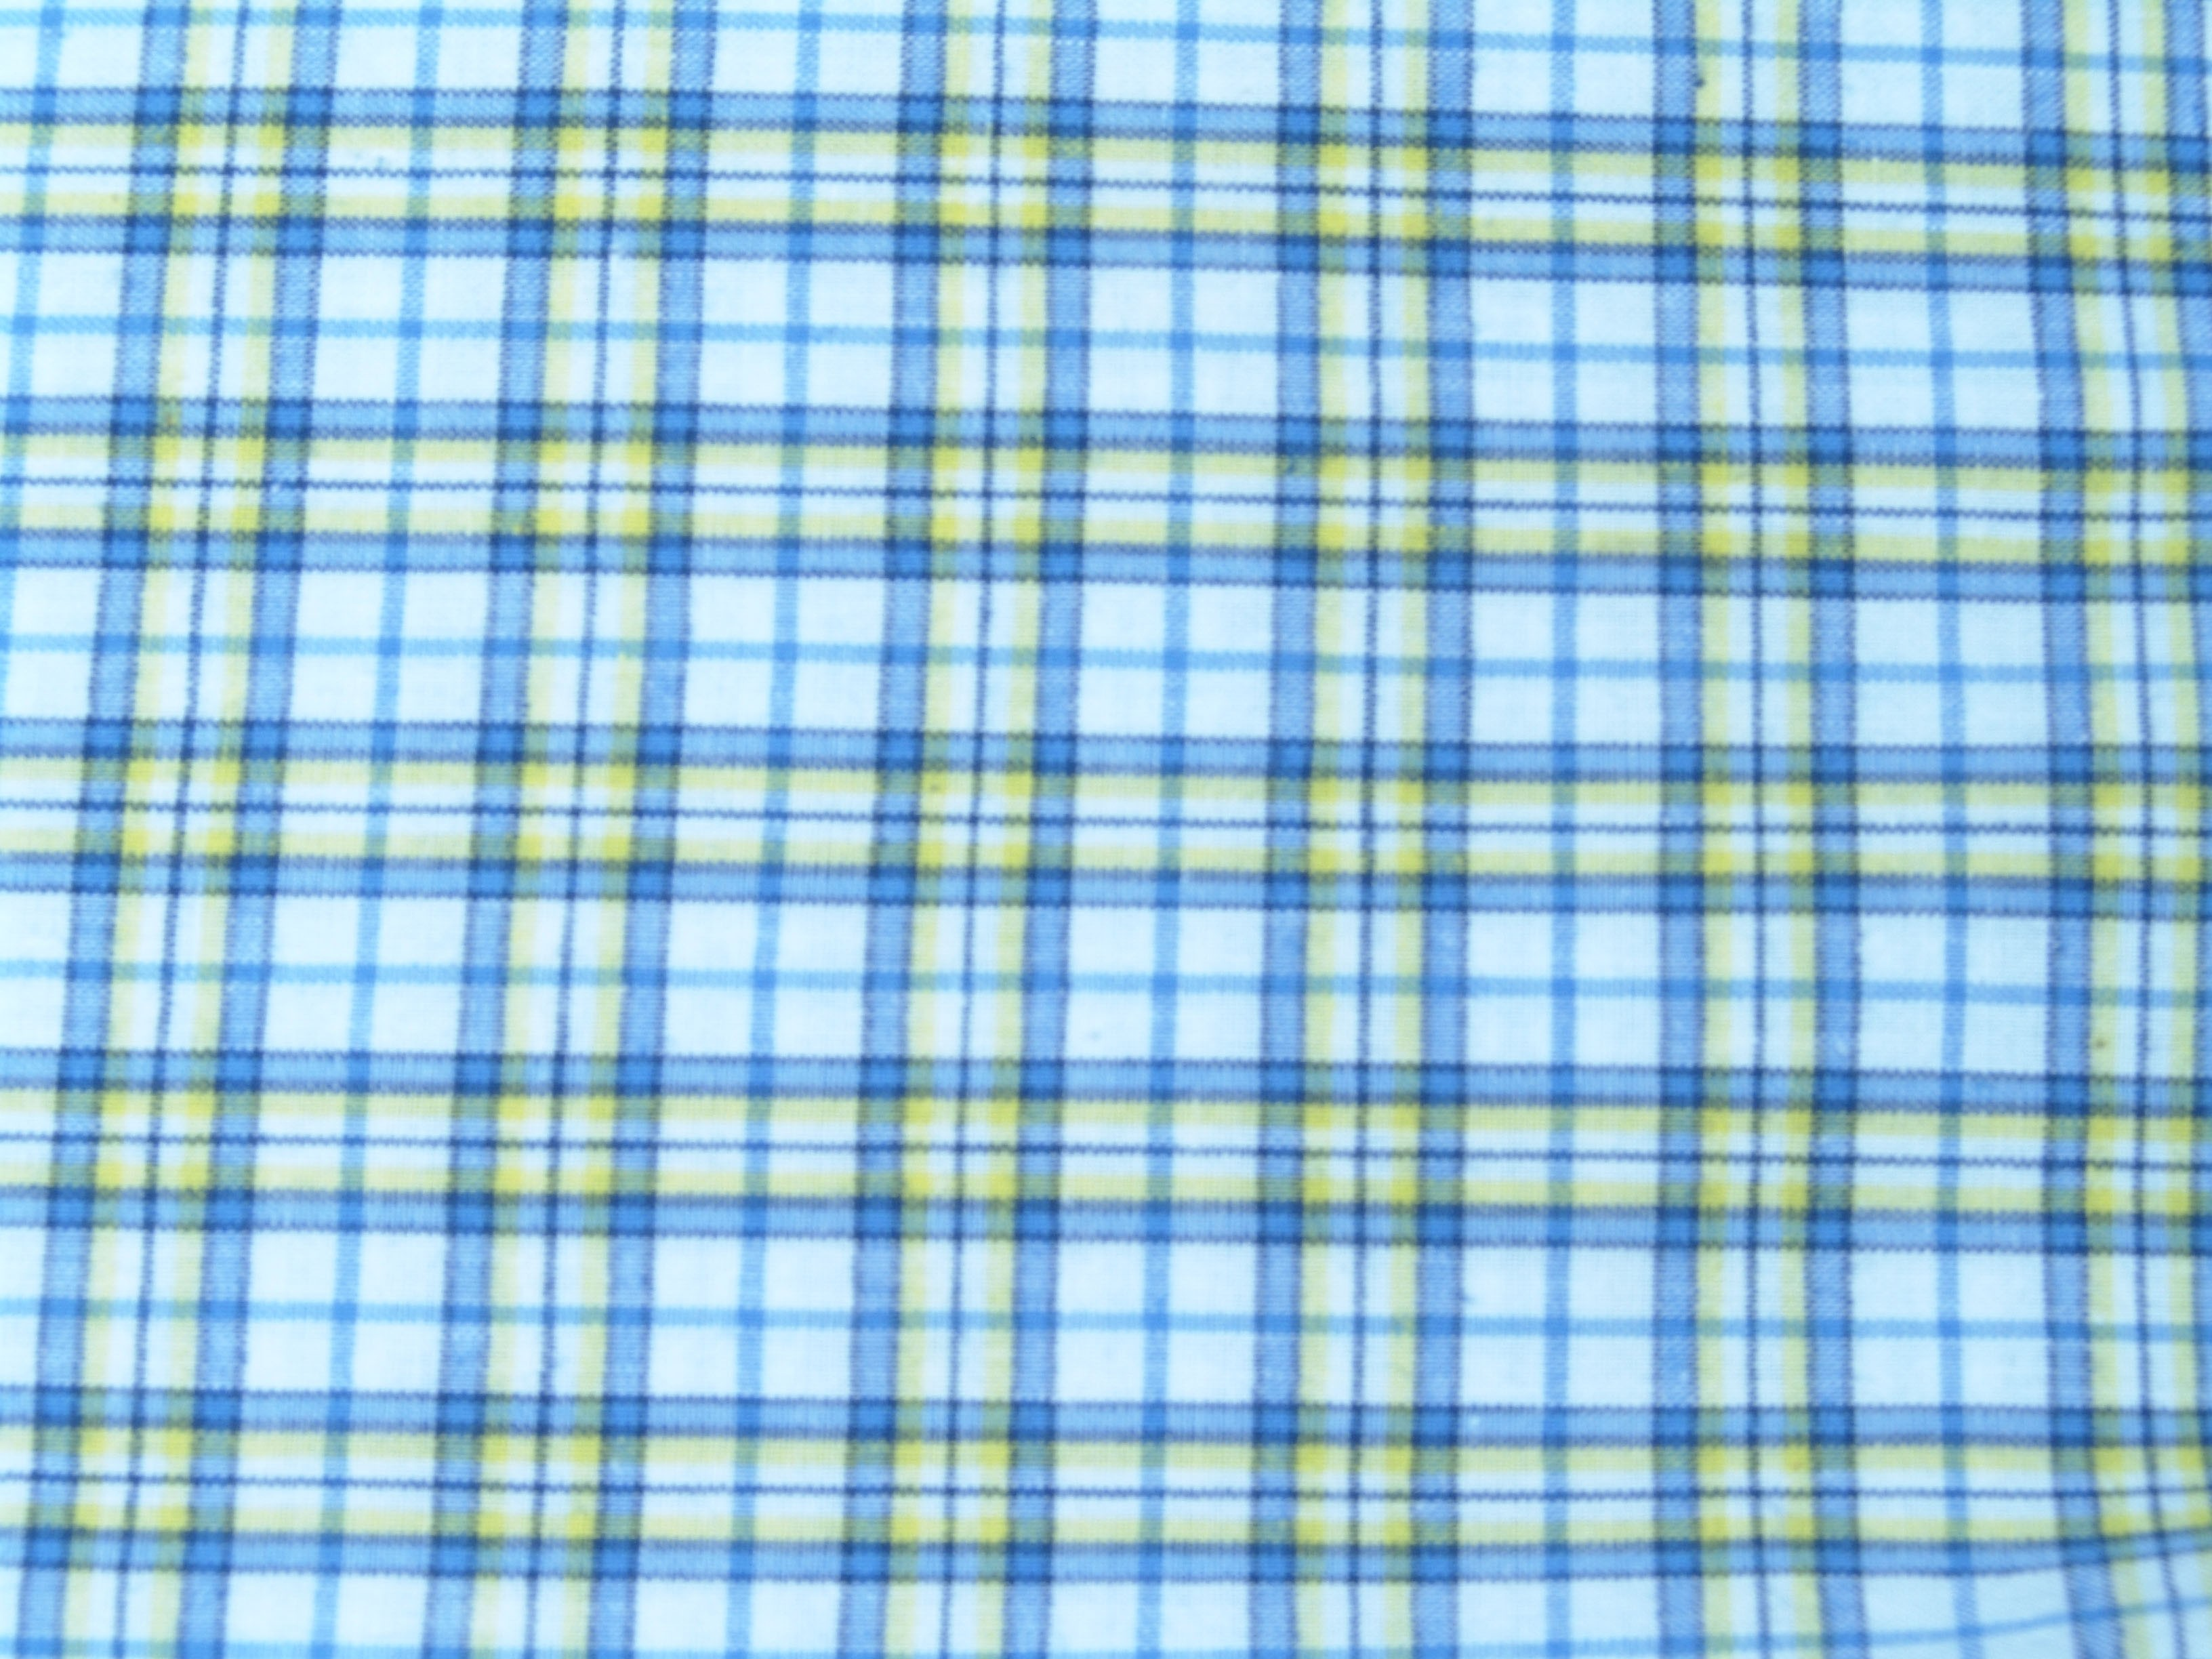 3264x2448 > Blue Plaid Wallpapers